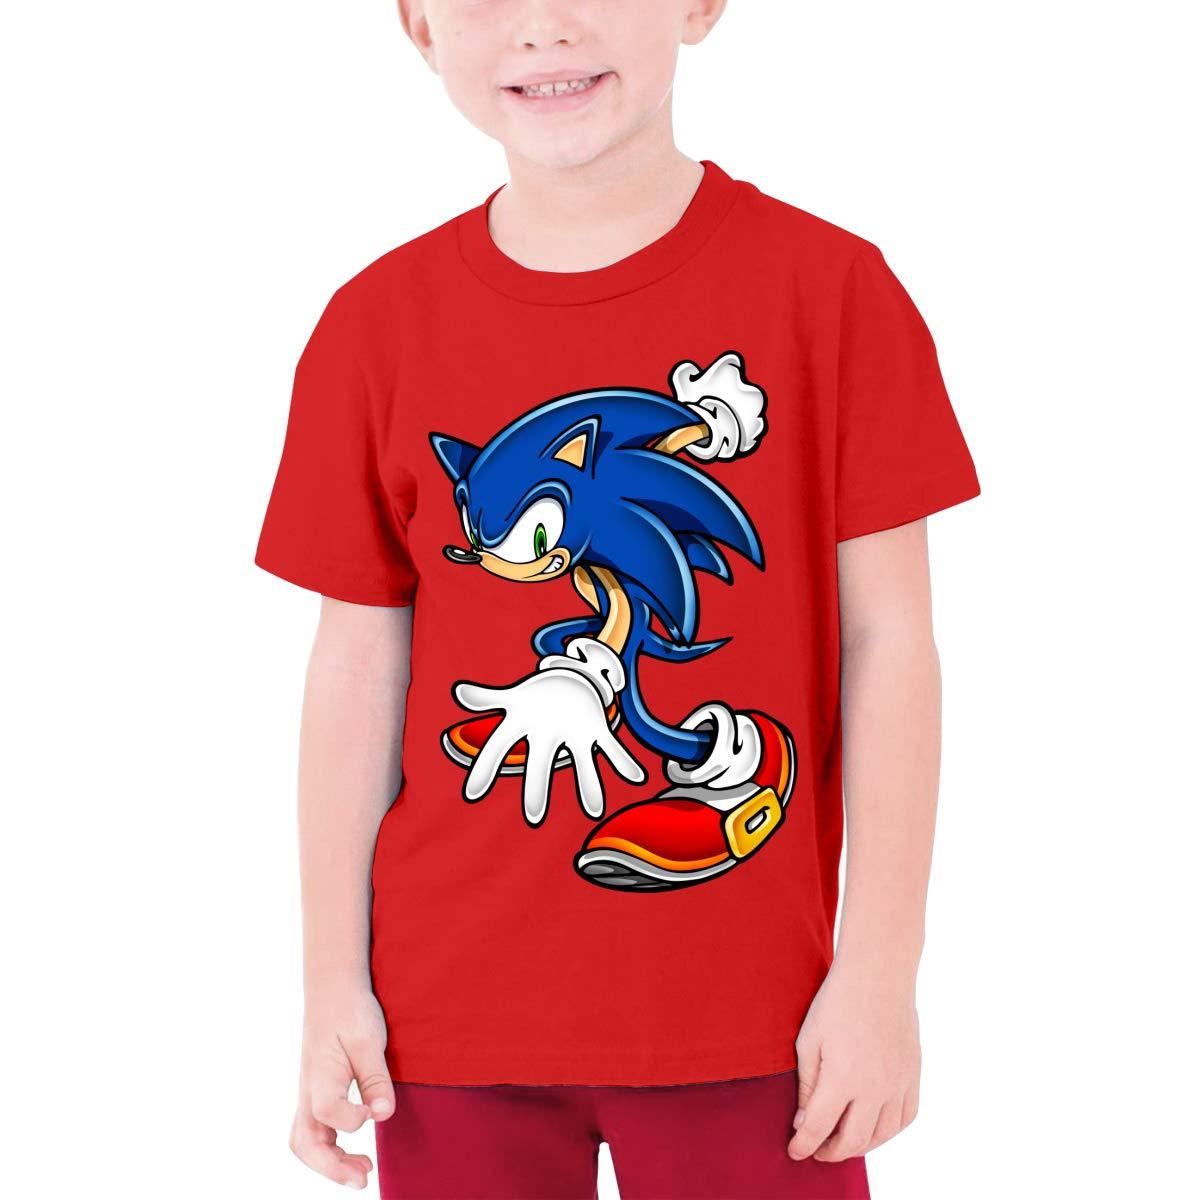 MDClothI Youth Boys /& Grils Sonic Hedgehog Casual Style Long Sleeve T-Shirt